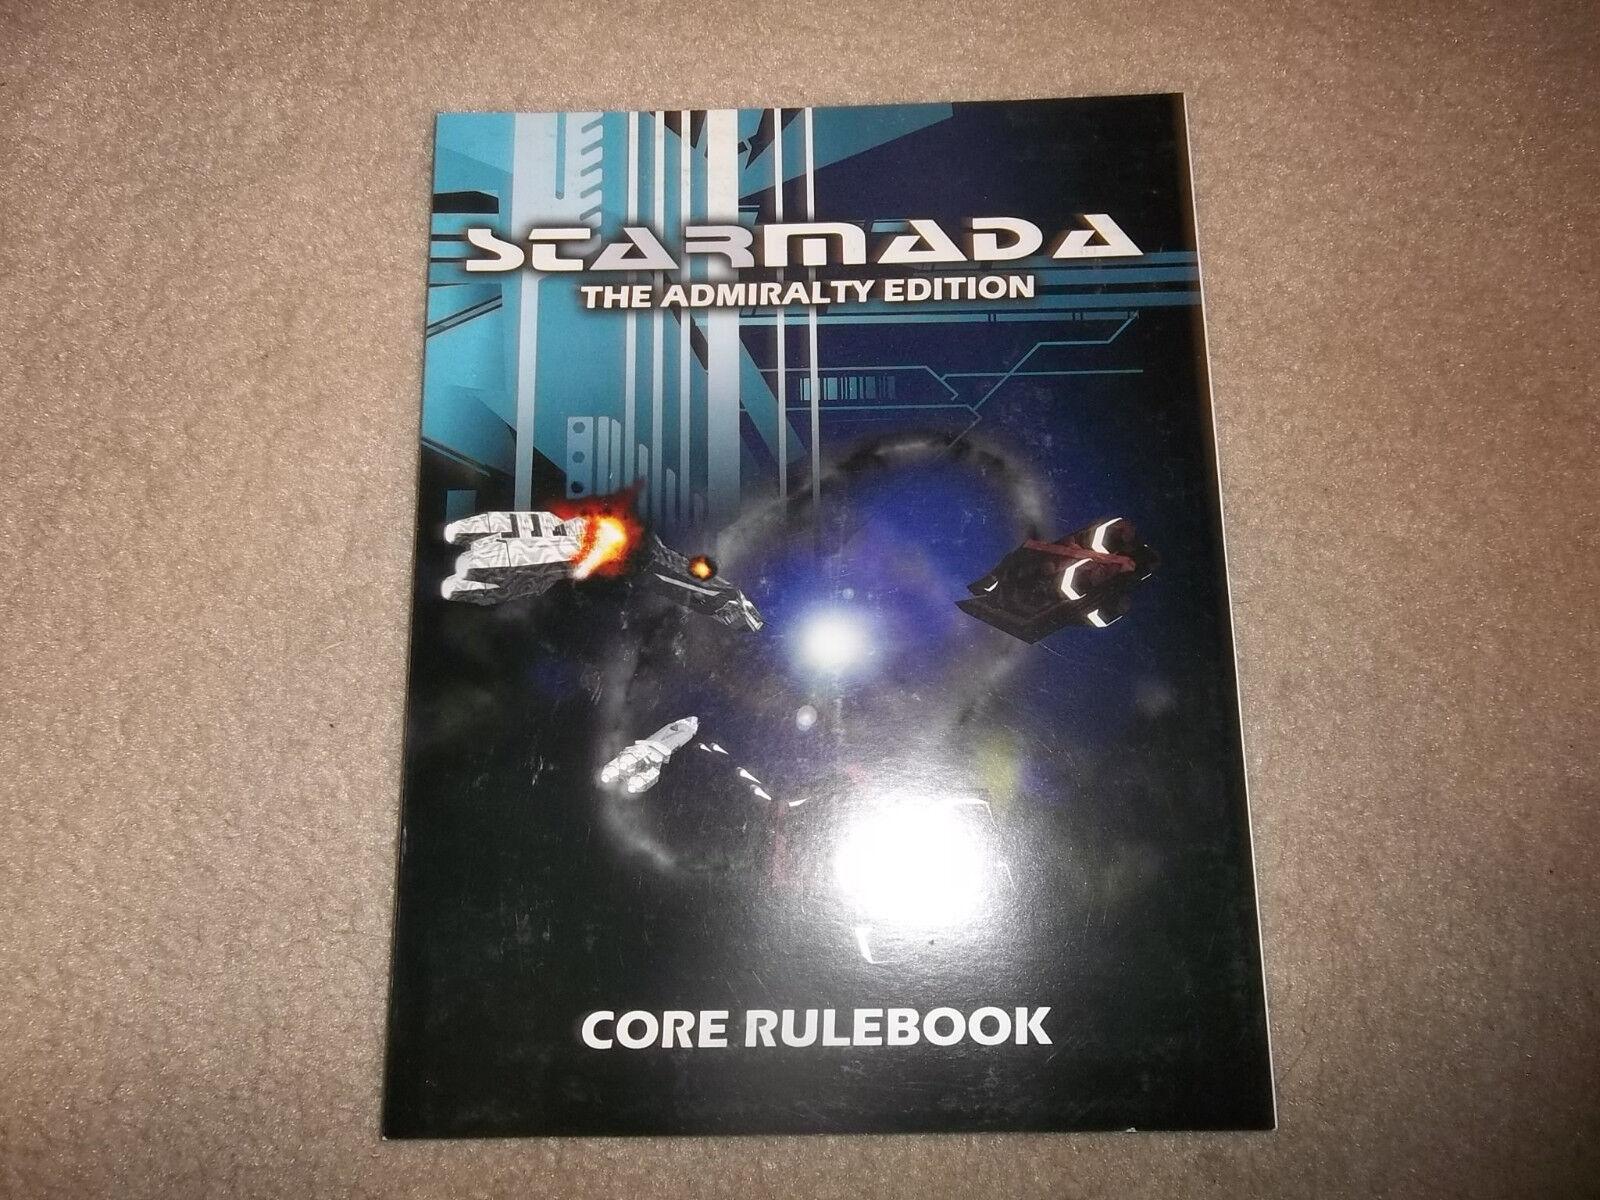 Starmada the Admiralty Edition Core Rulebook